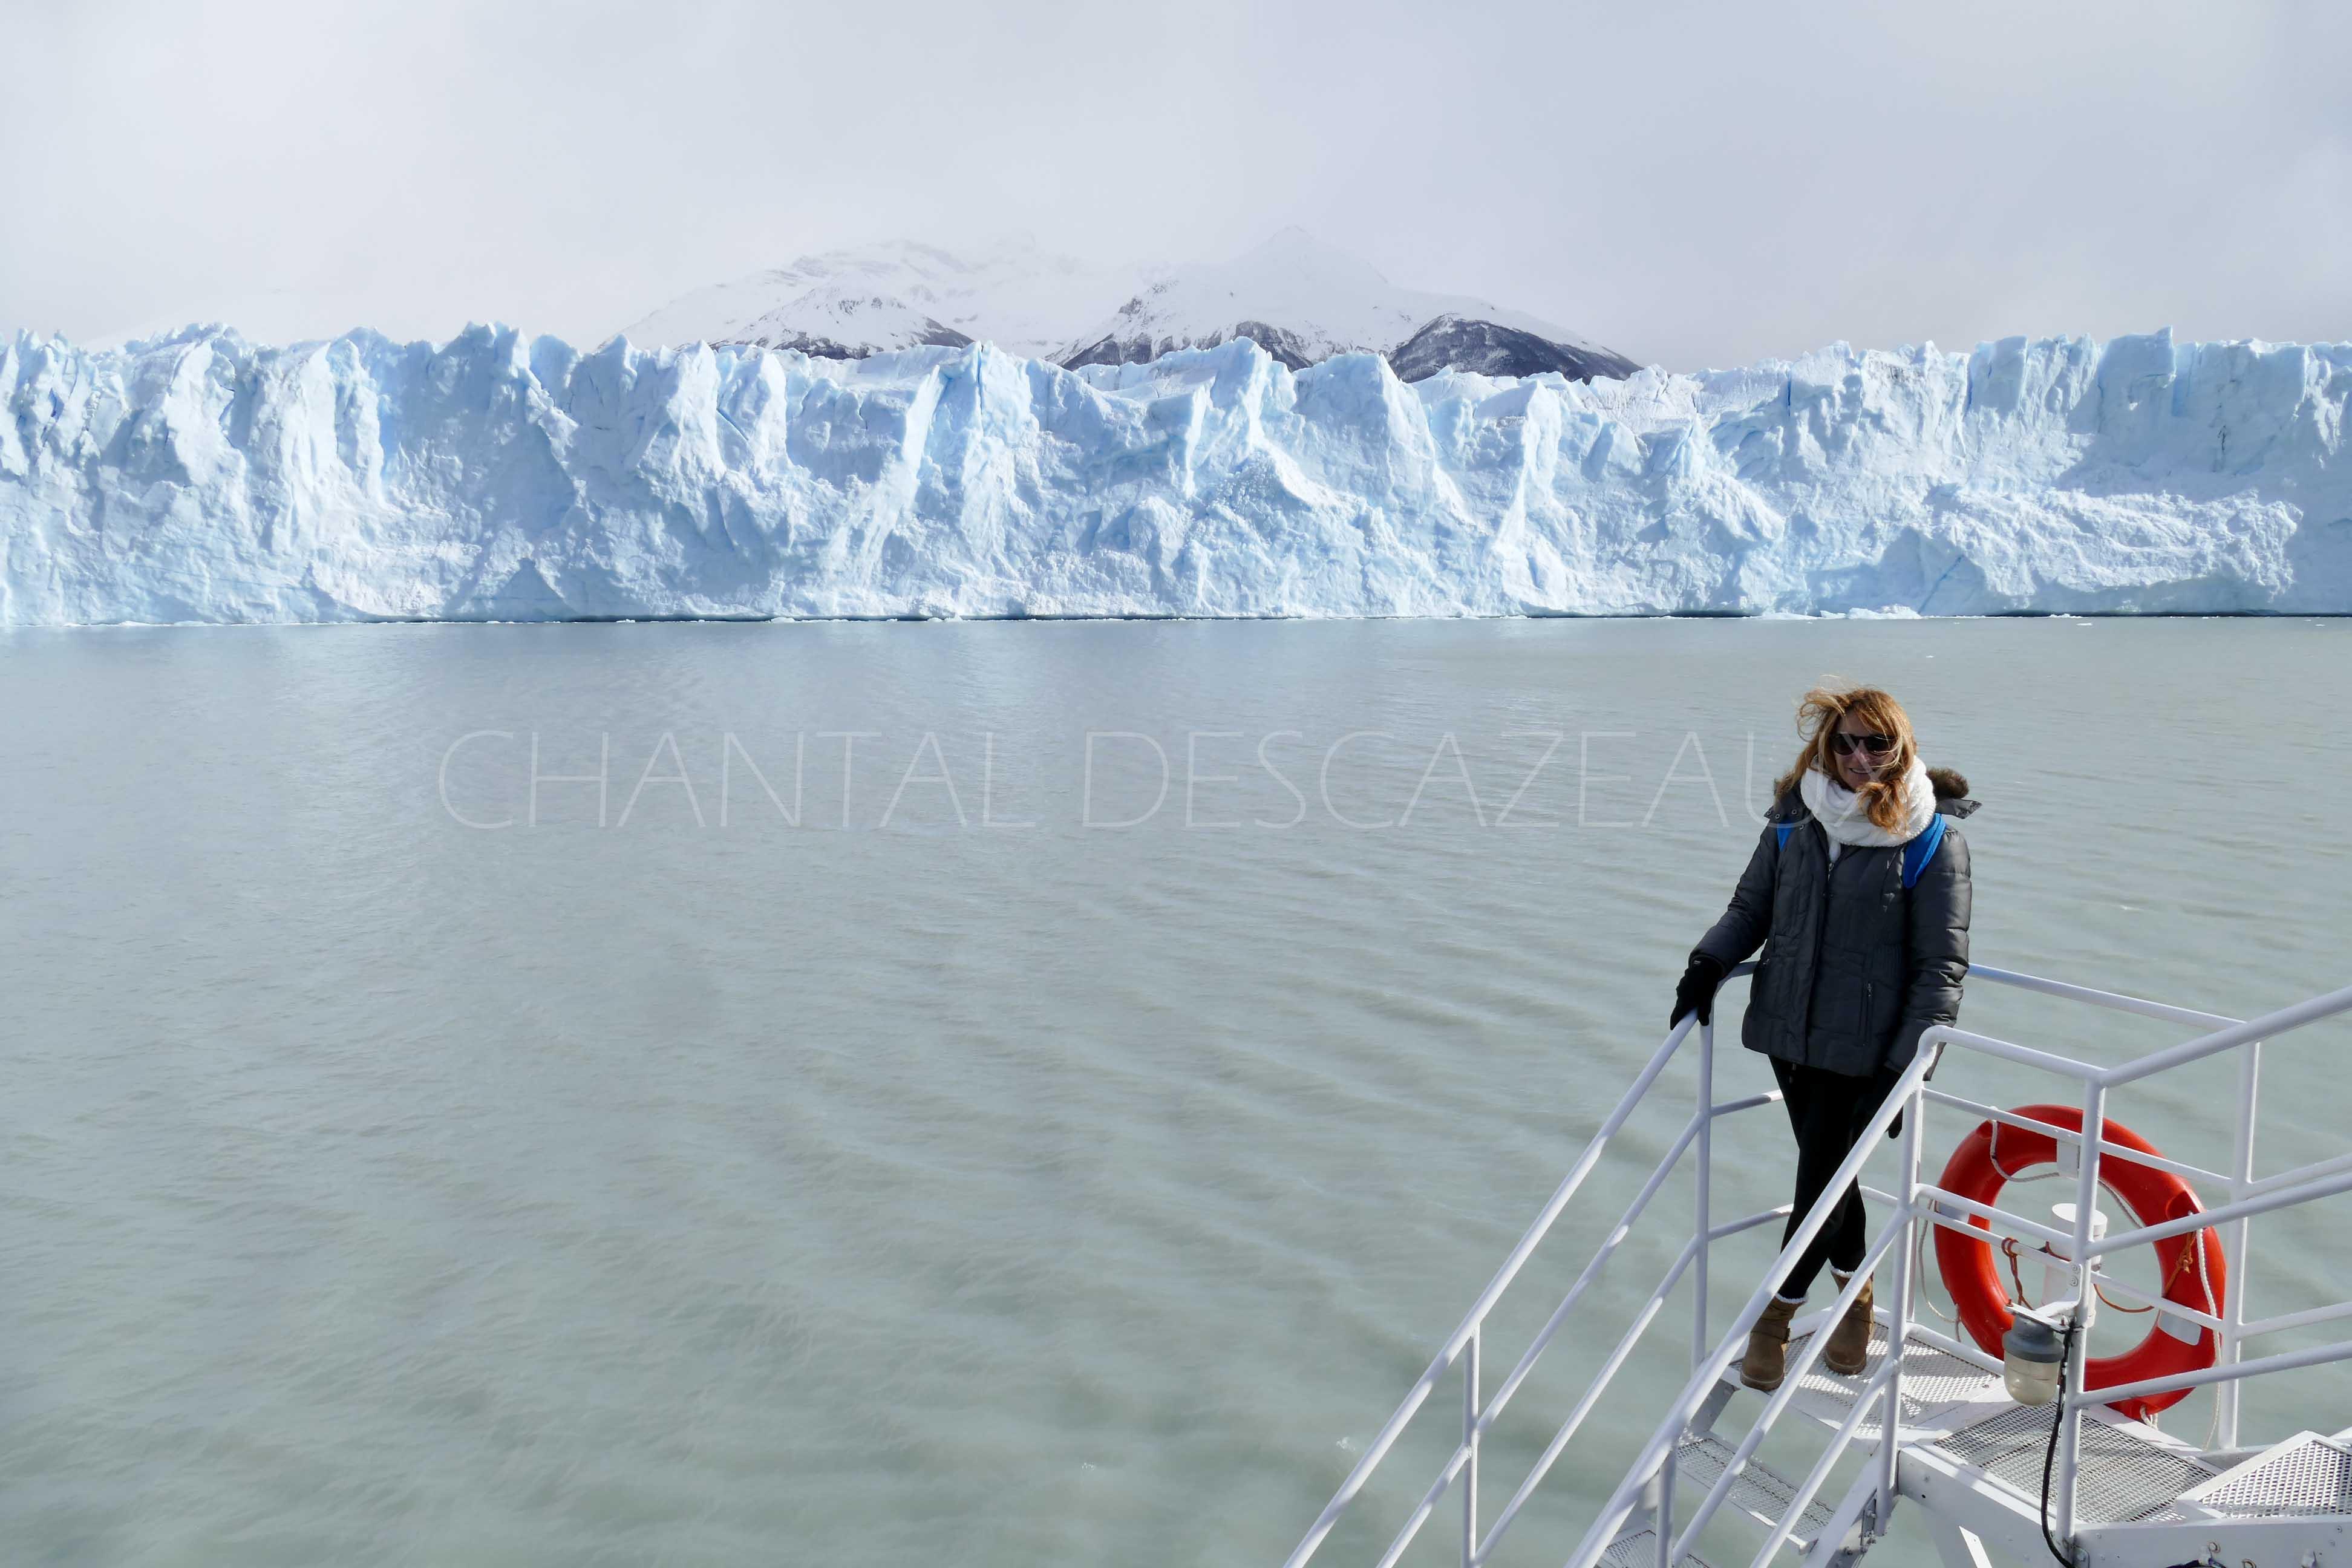 Patagonie - Puerto Natales, Parc National Torres Del Paine et El Calafate